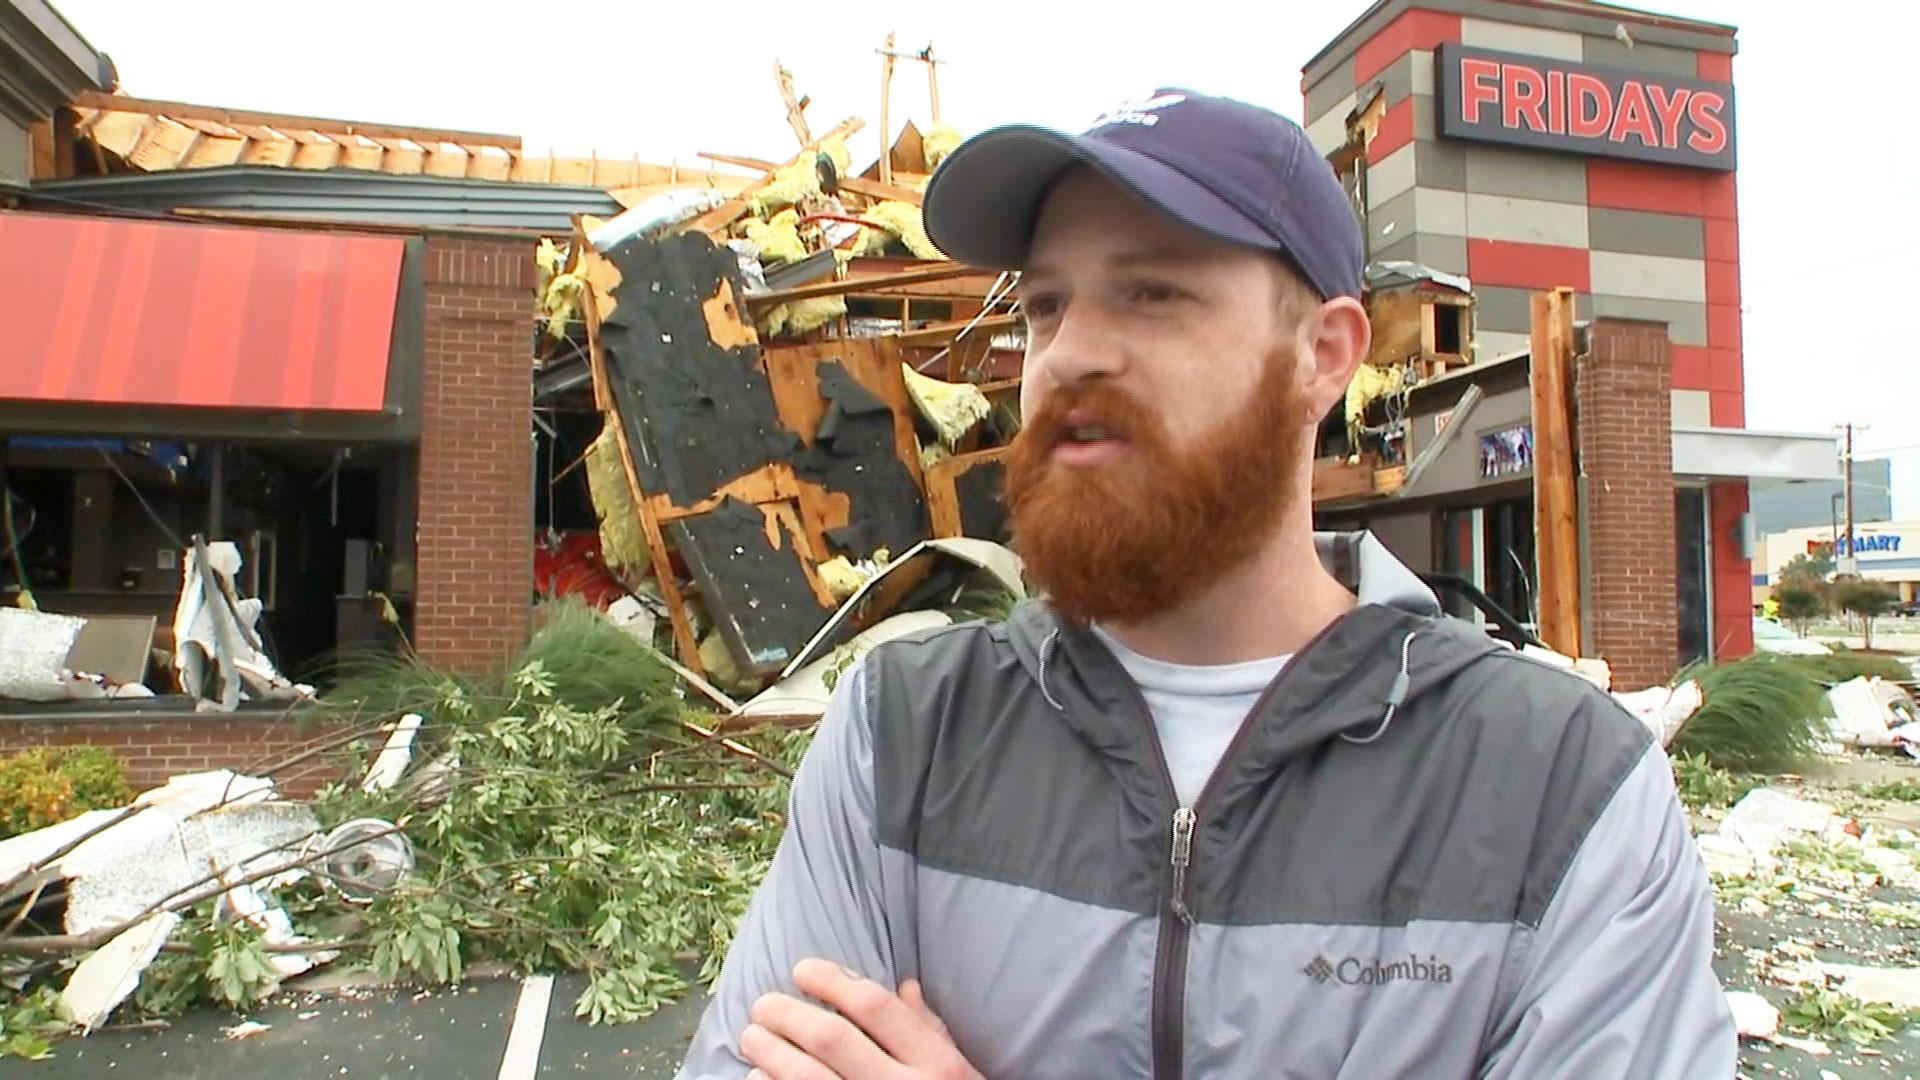 Tornado Destroys Businesses Injures Dozens In Tulsa